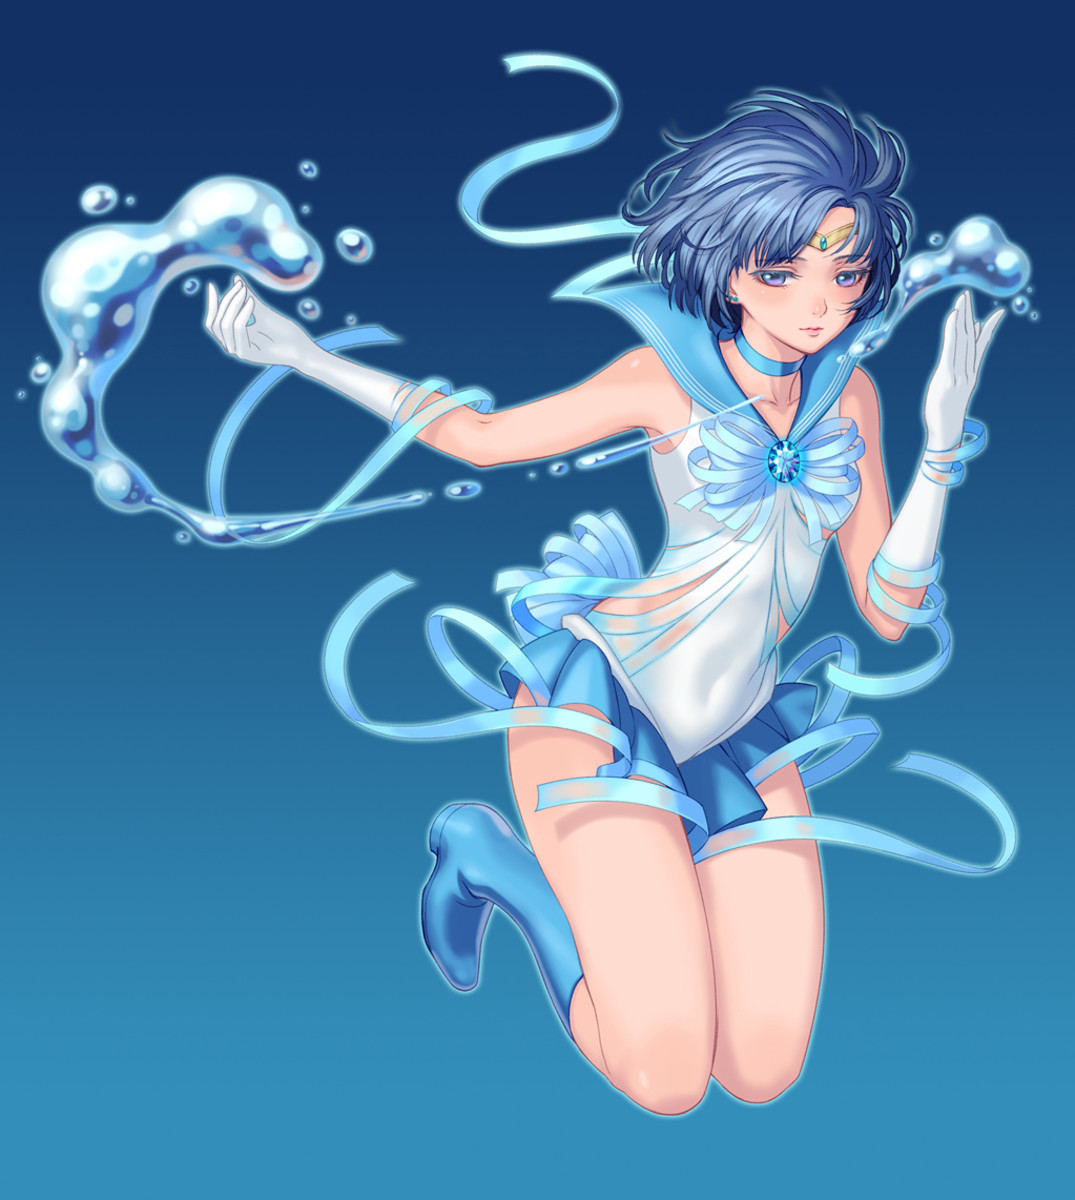 Ami Mizuno from Bishoujo Senshi Sailor Moon